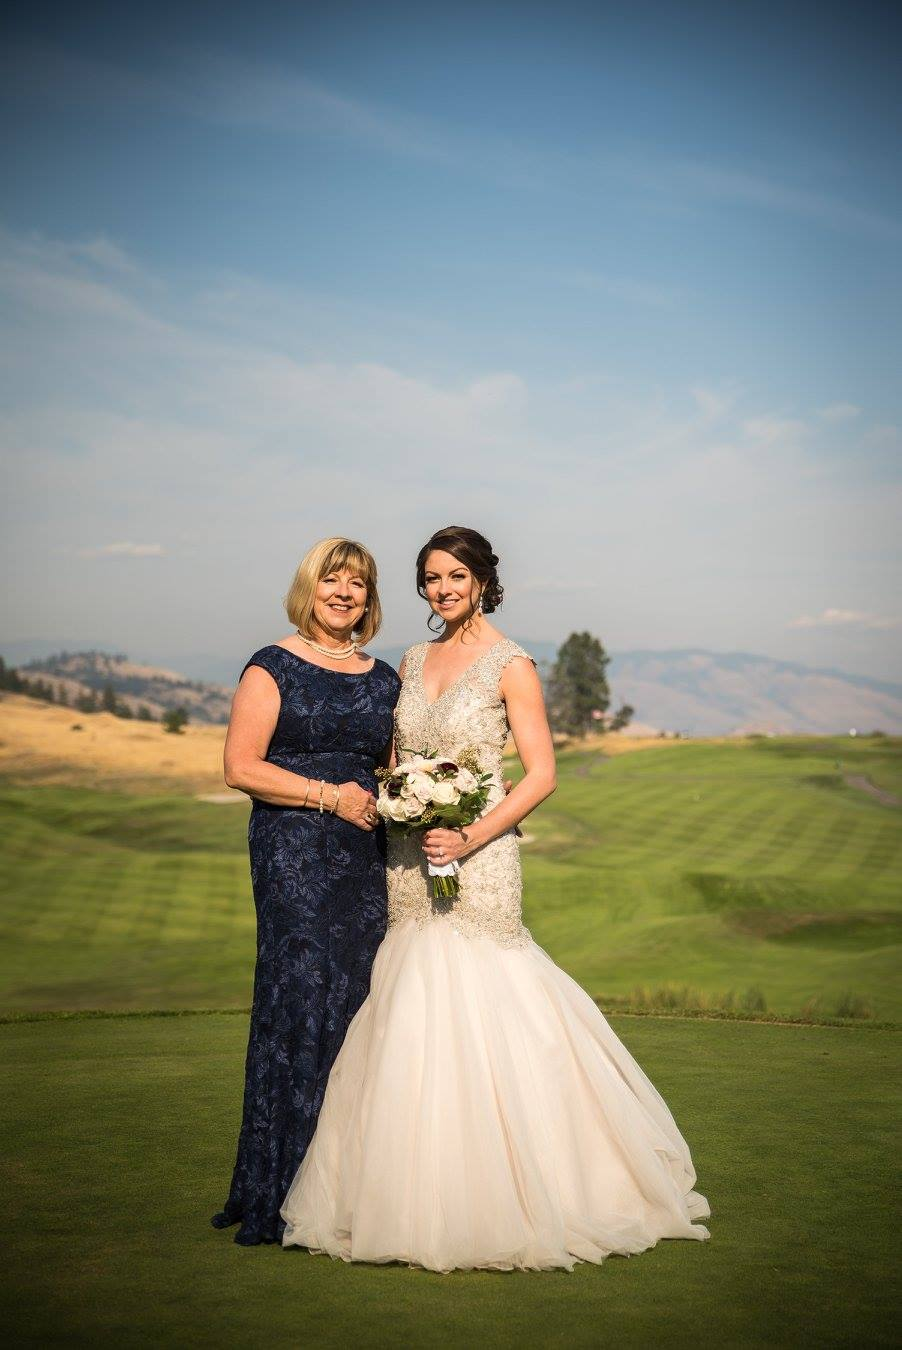 Cassandra Cross and mom wedding 2017 hair.jpg